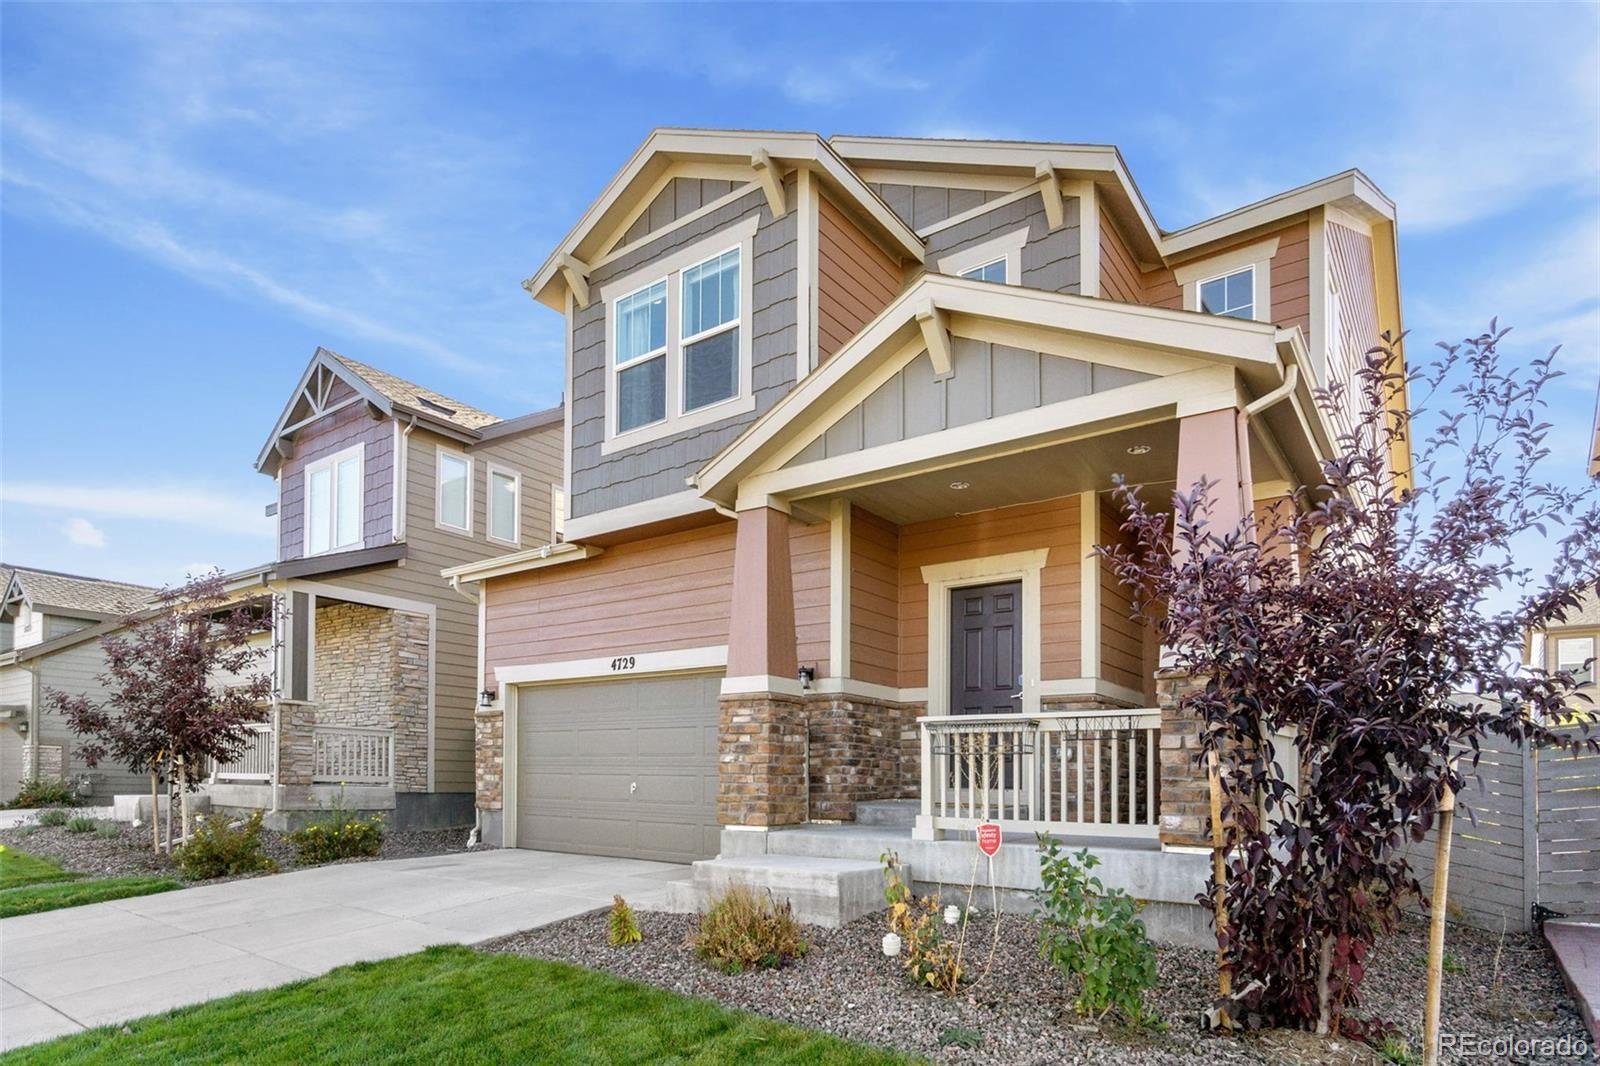 Photo of 4729 Helena Street, Denver, CO 80239 (MLS # 6387873)